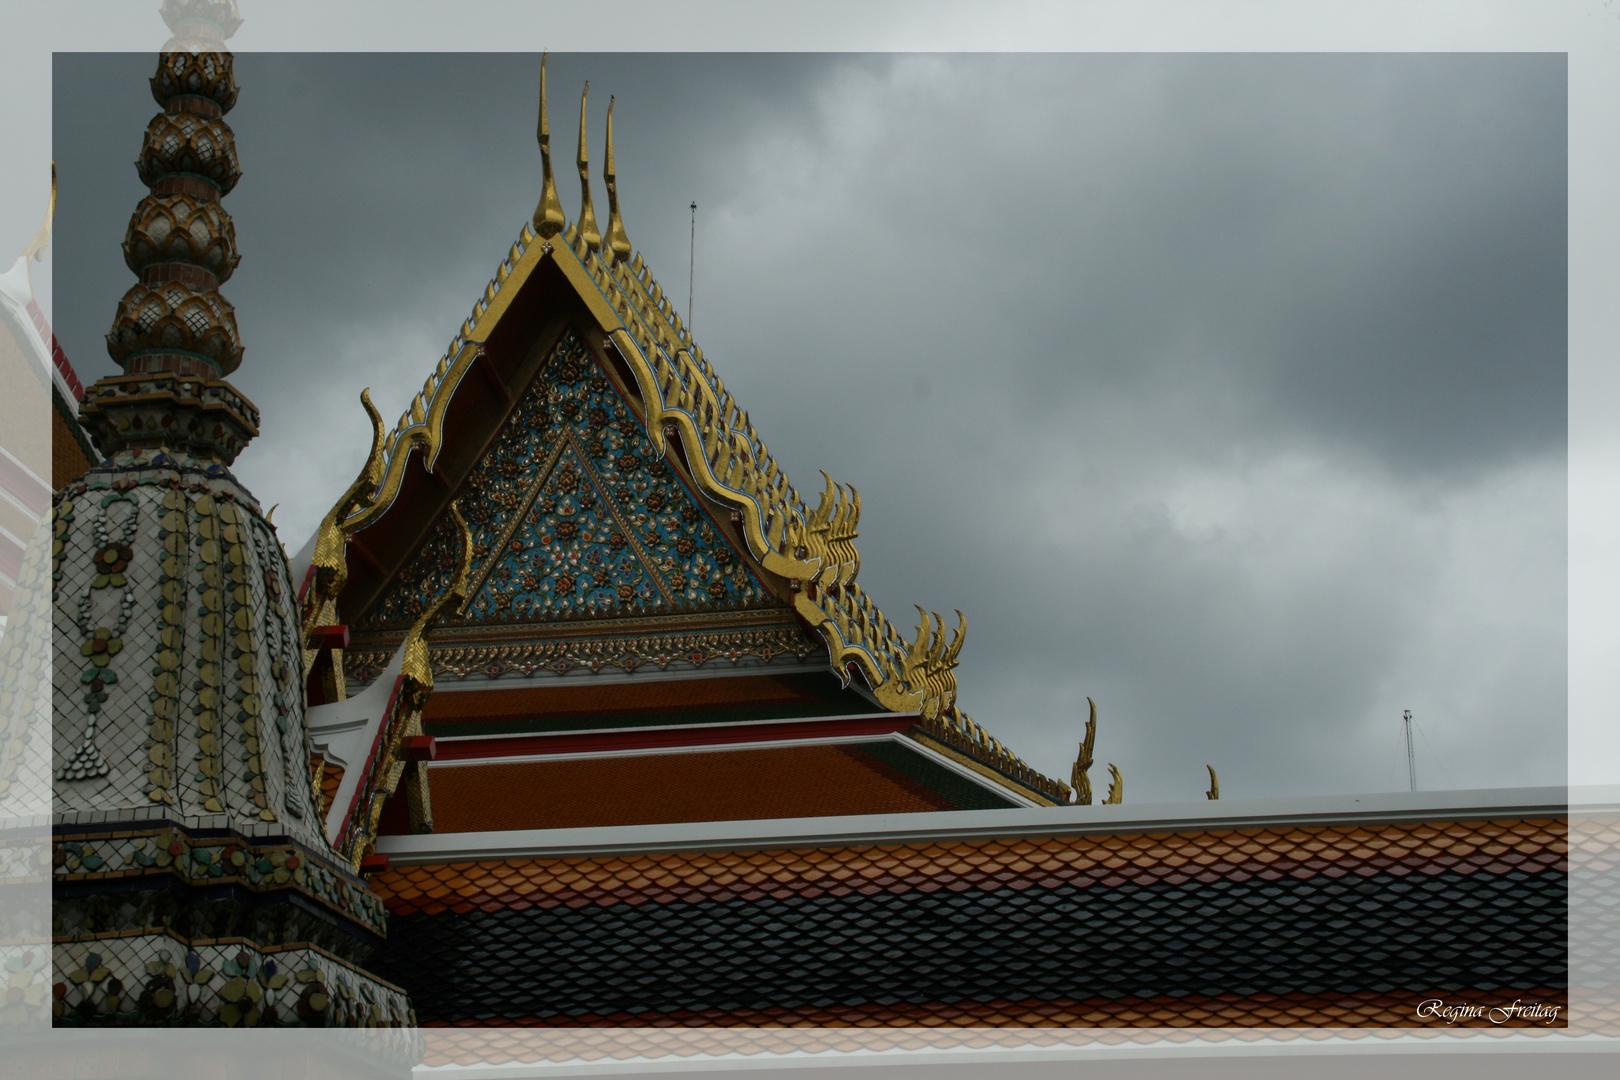 Dunkle Wolken über dem Tempel